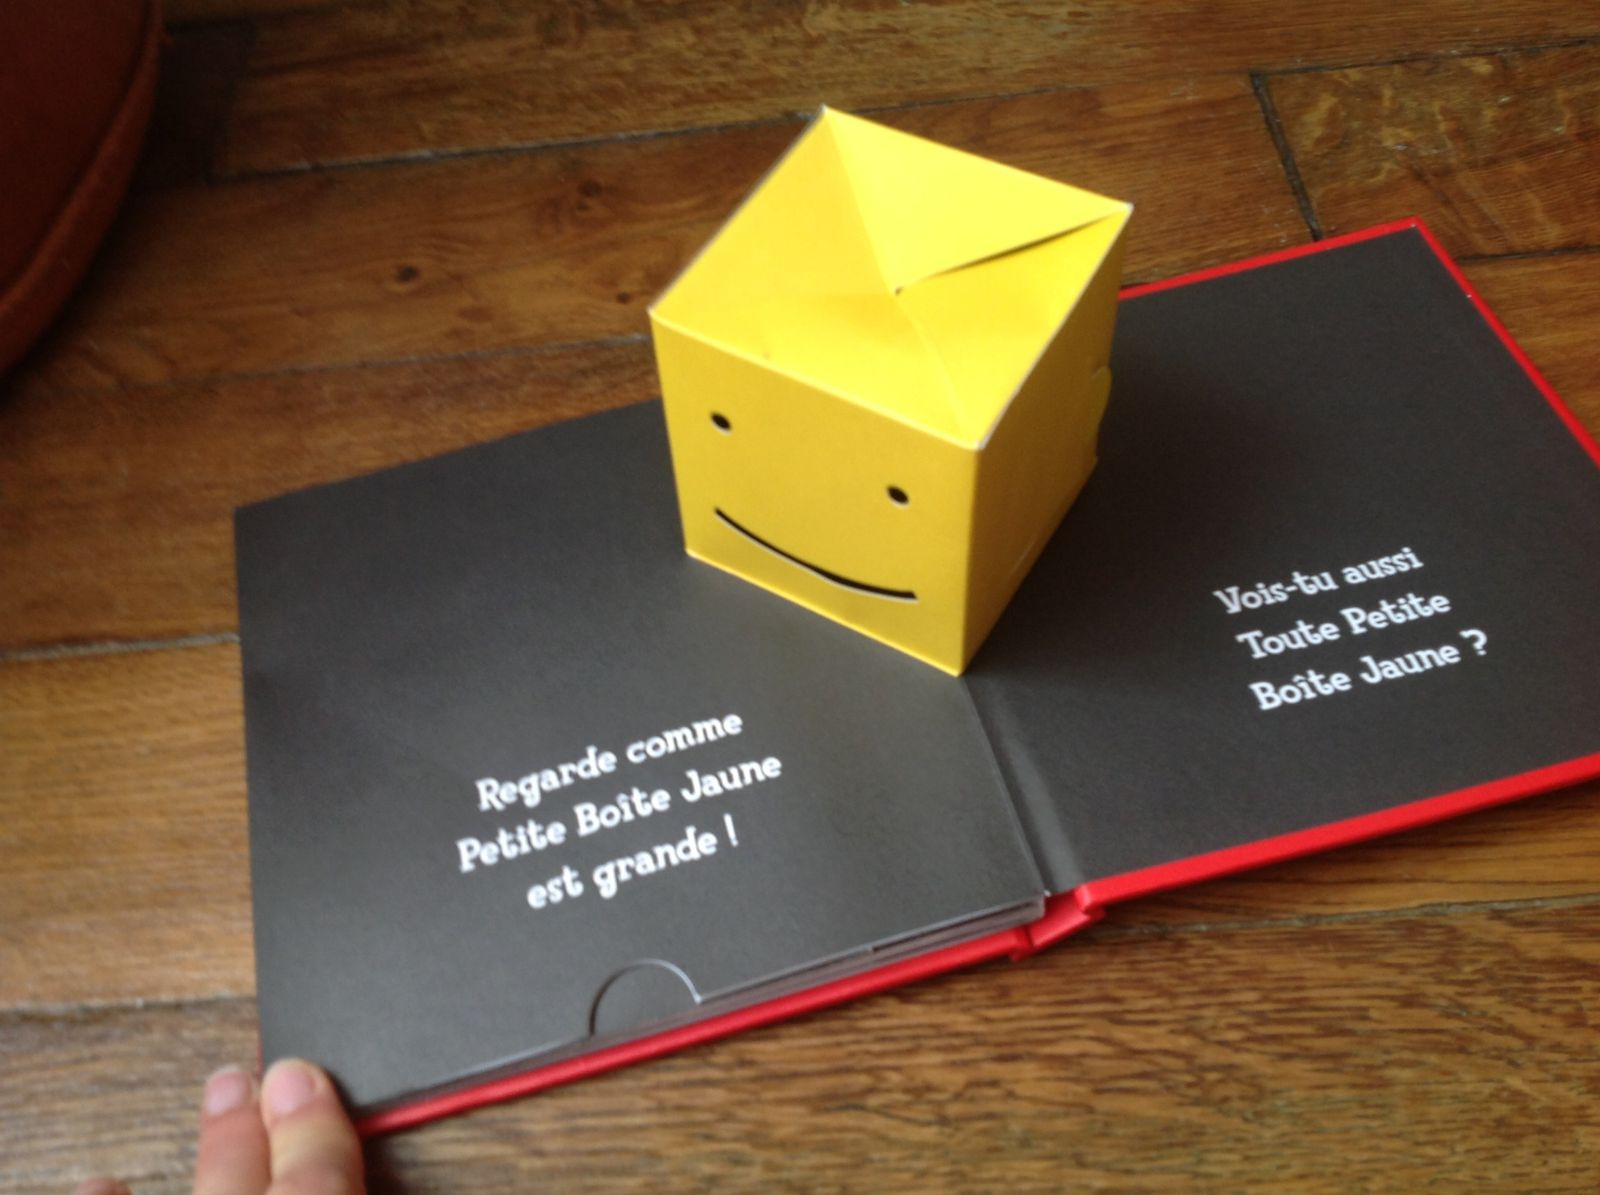 Petite boîte jaune de David A. Carter